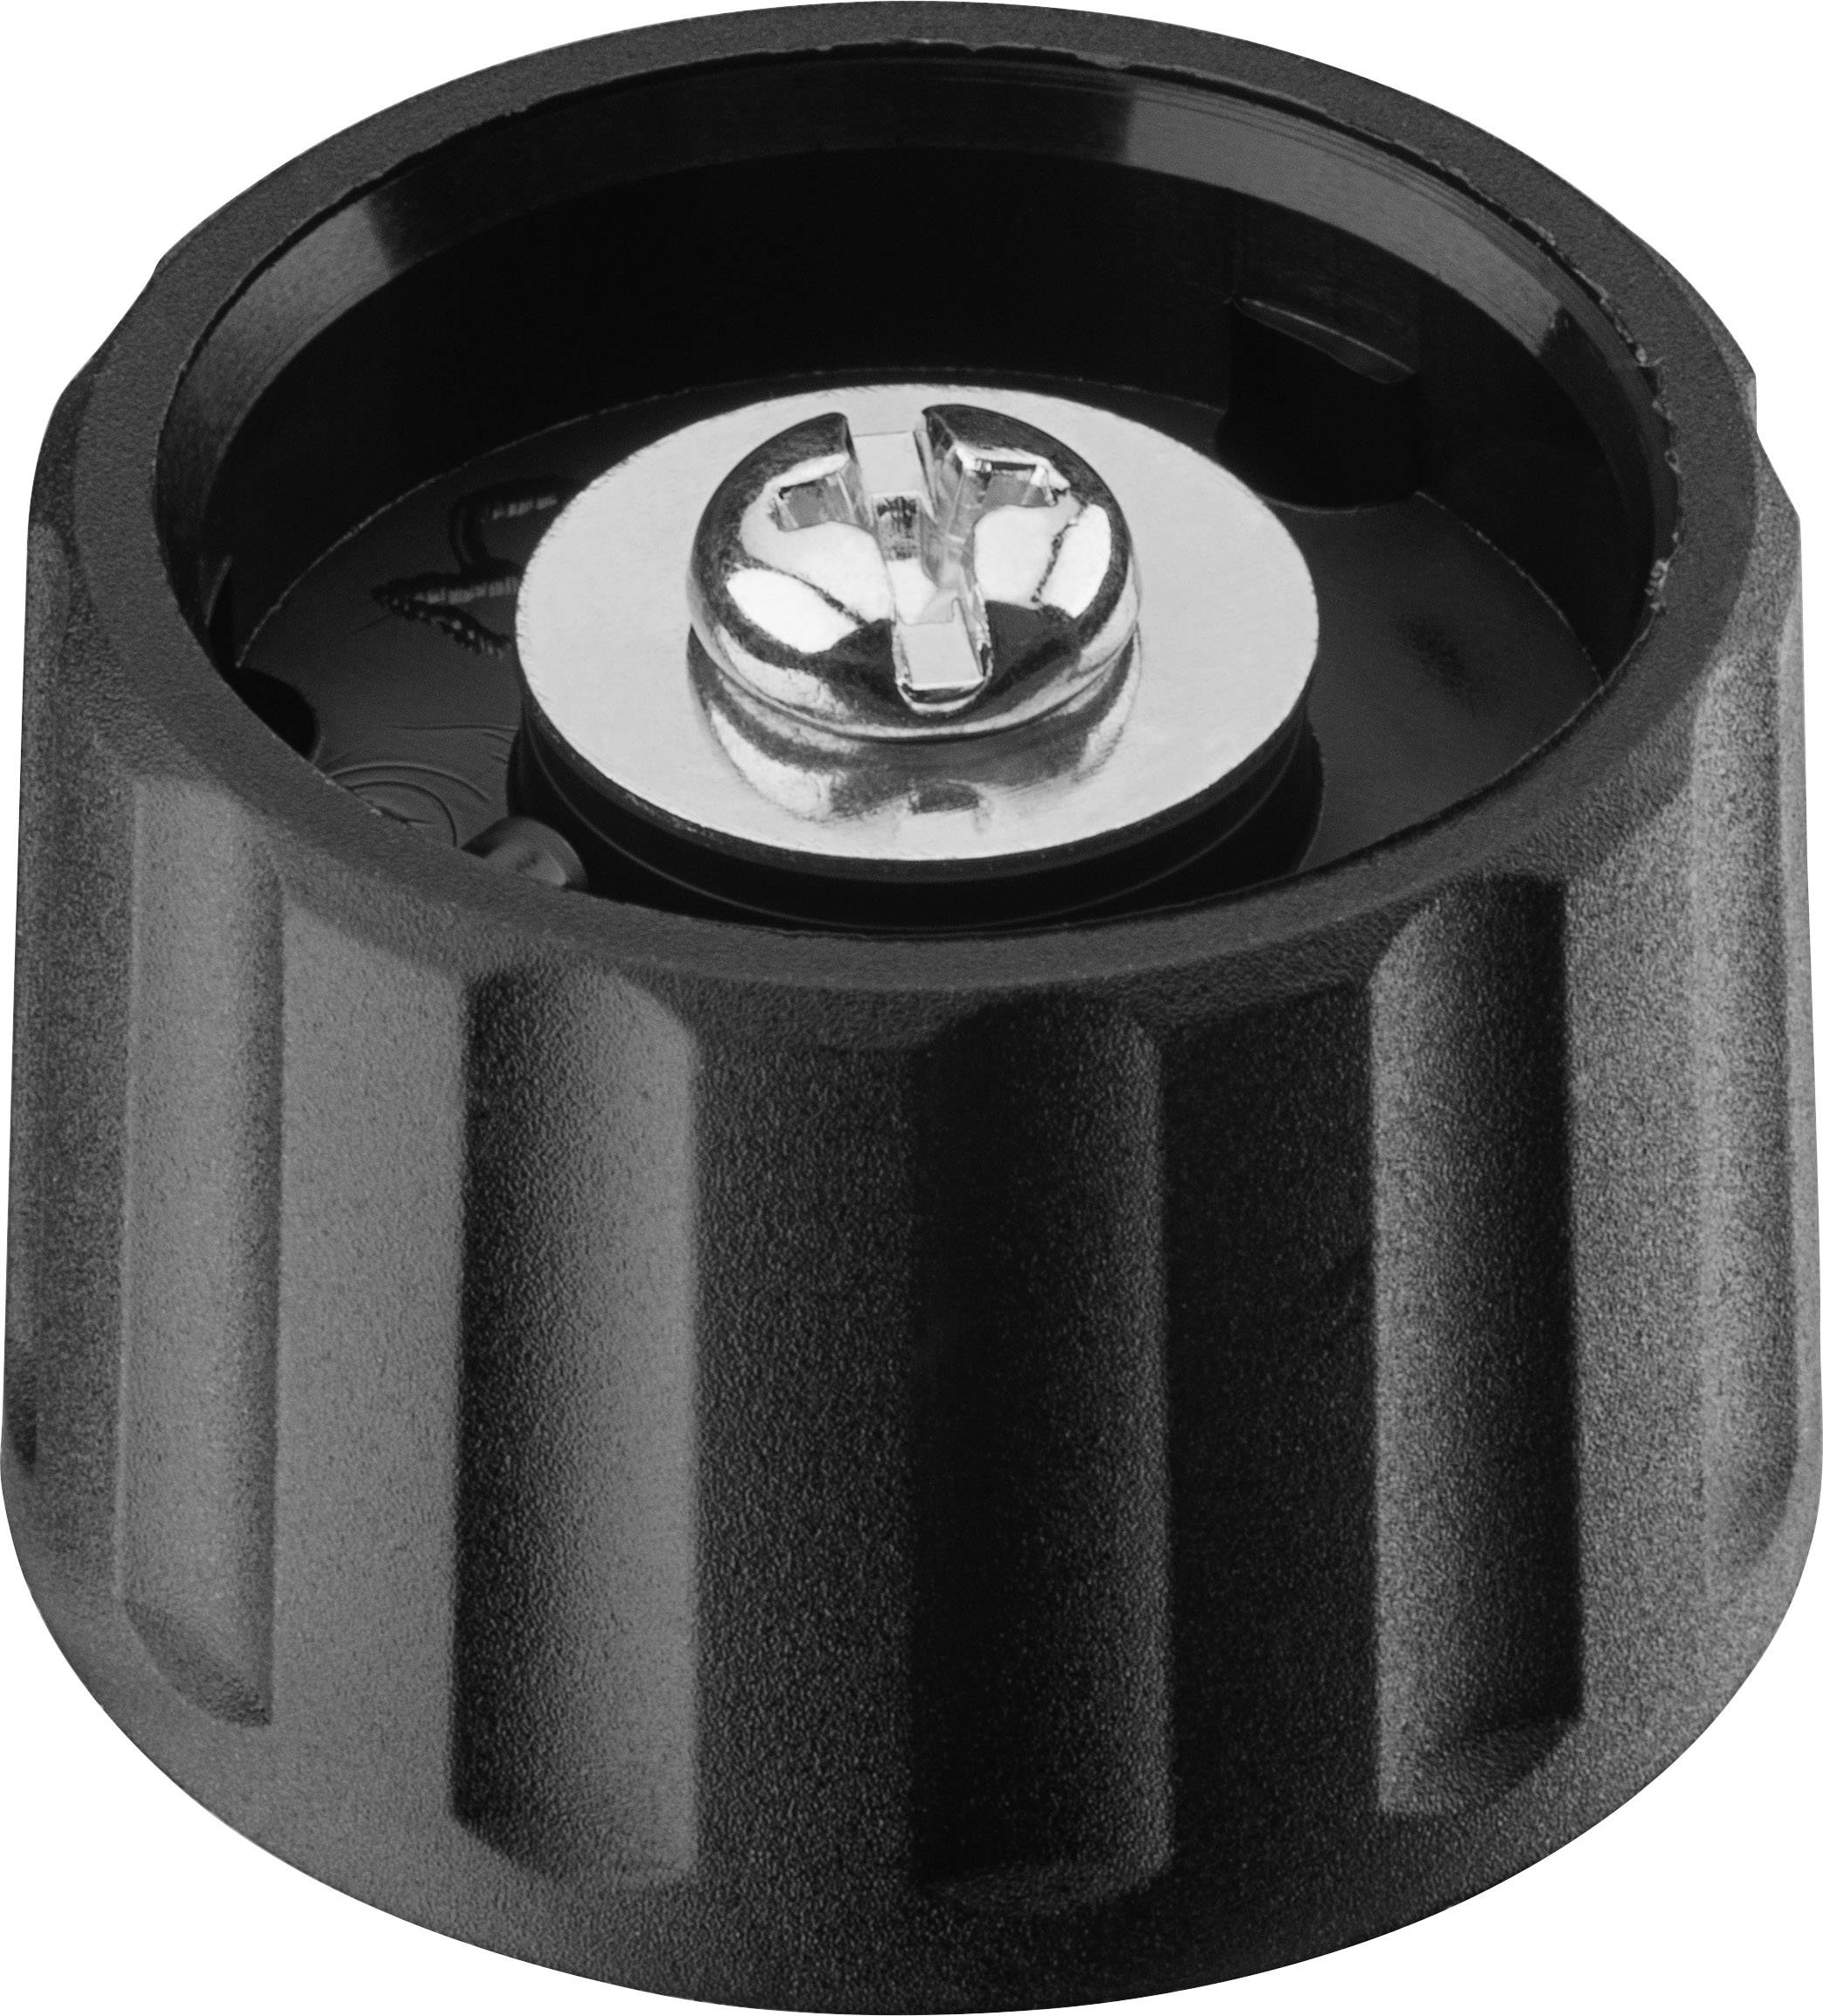 Otočný gombík Ritel 26 28 60 3, (Ø x v) 28 mm x 18.2 mm, čierna, 1 ks